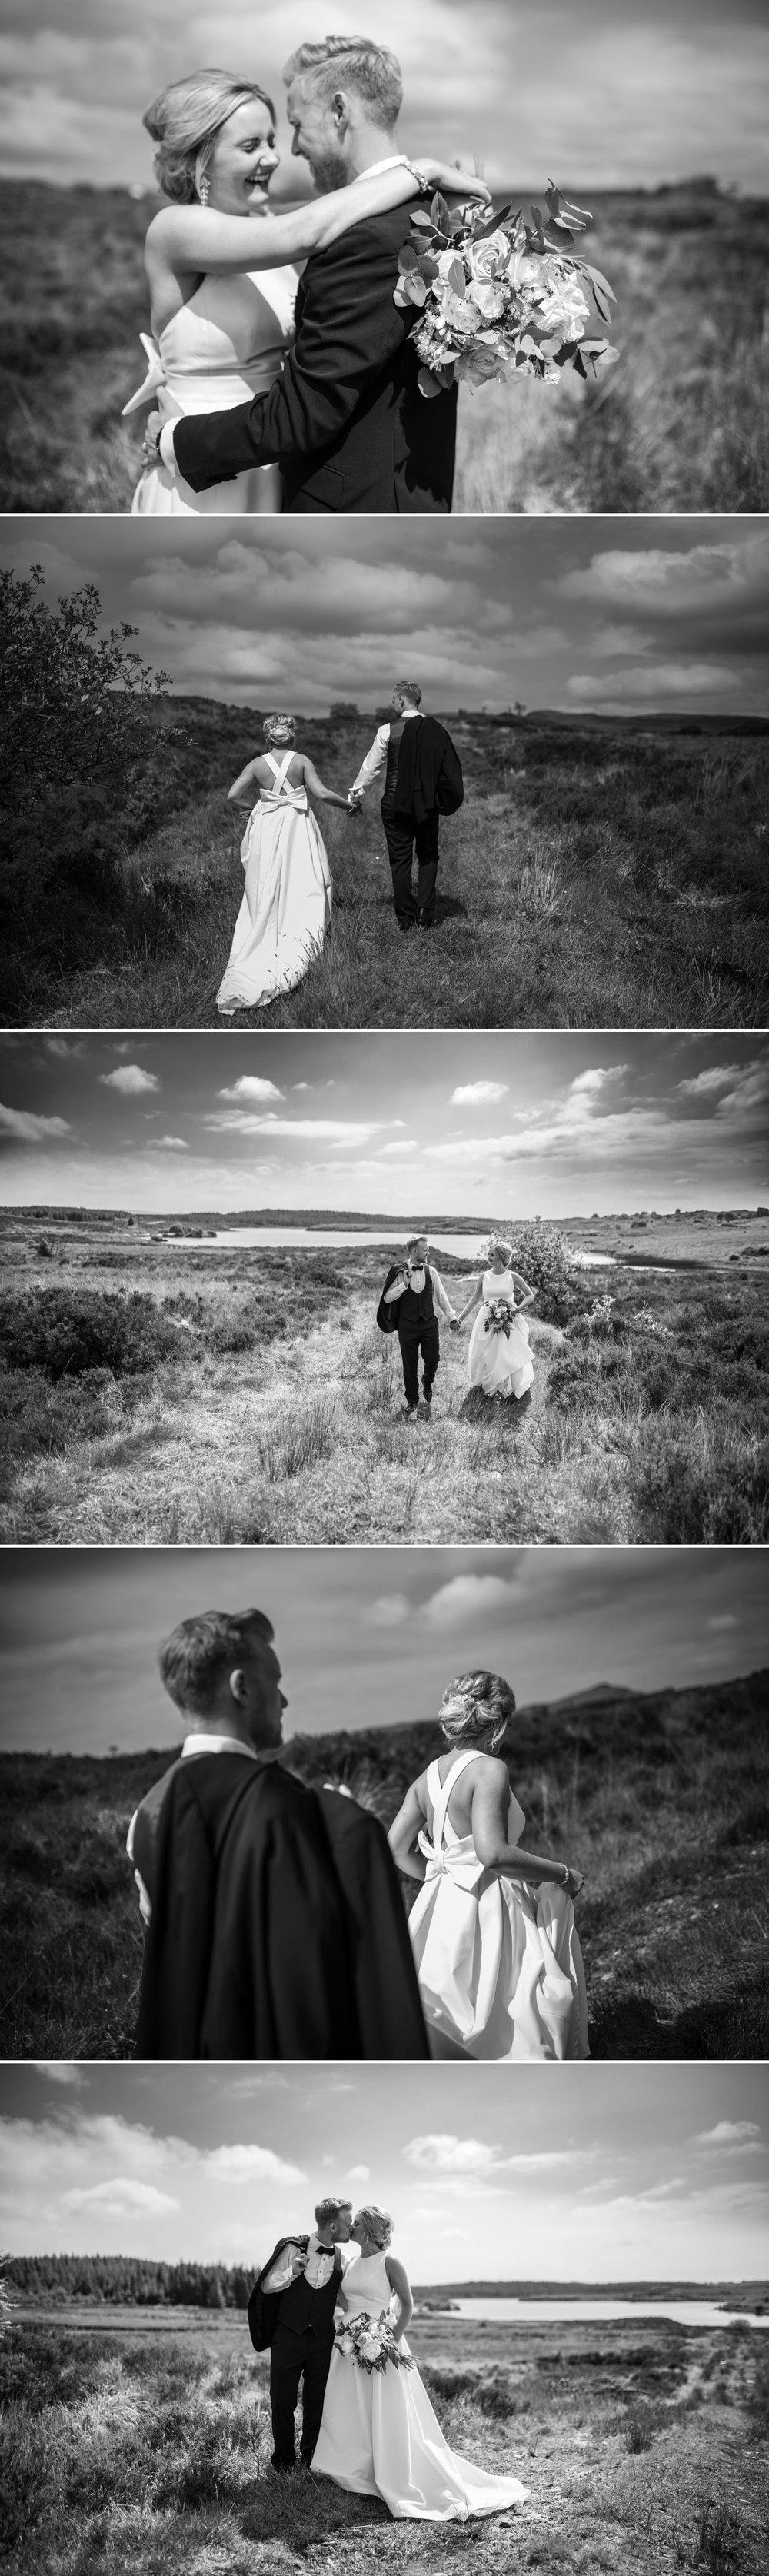 best wedding photographers northern ireland 12.jpg